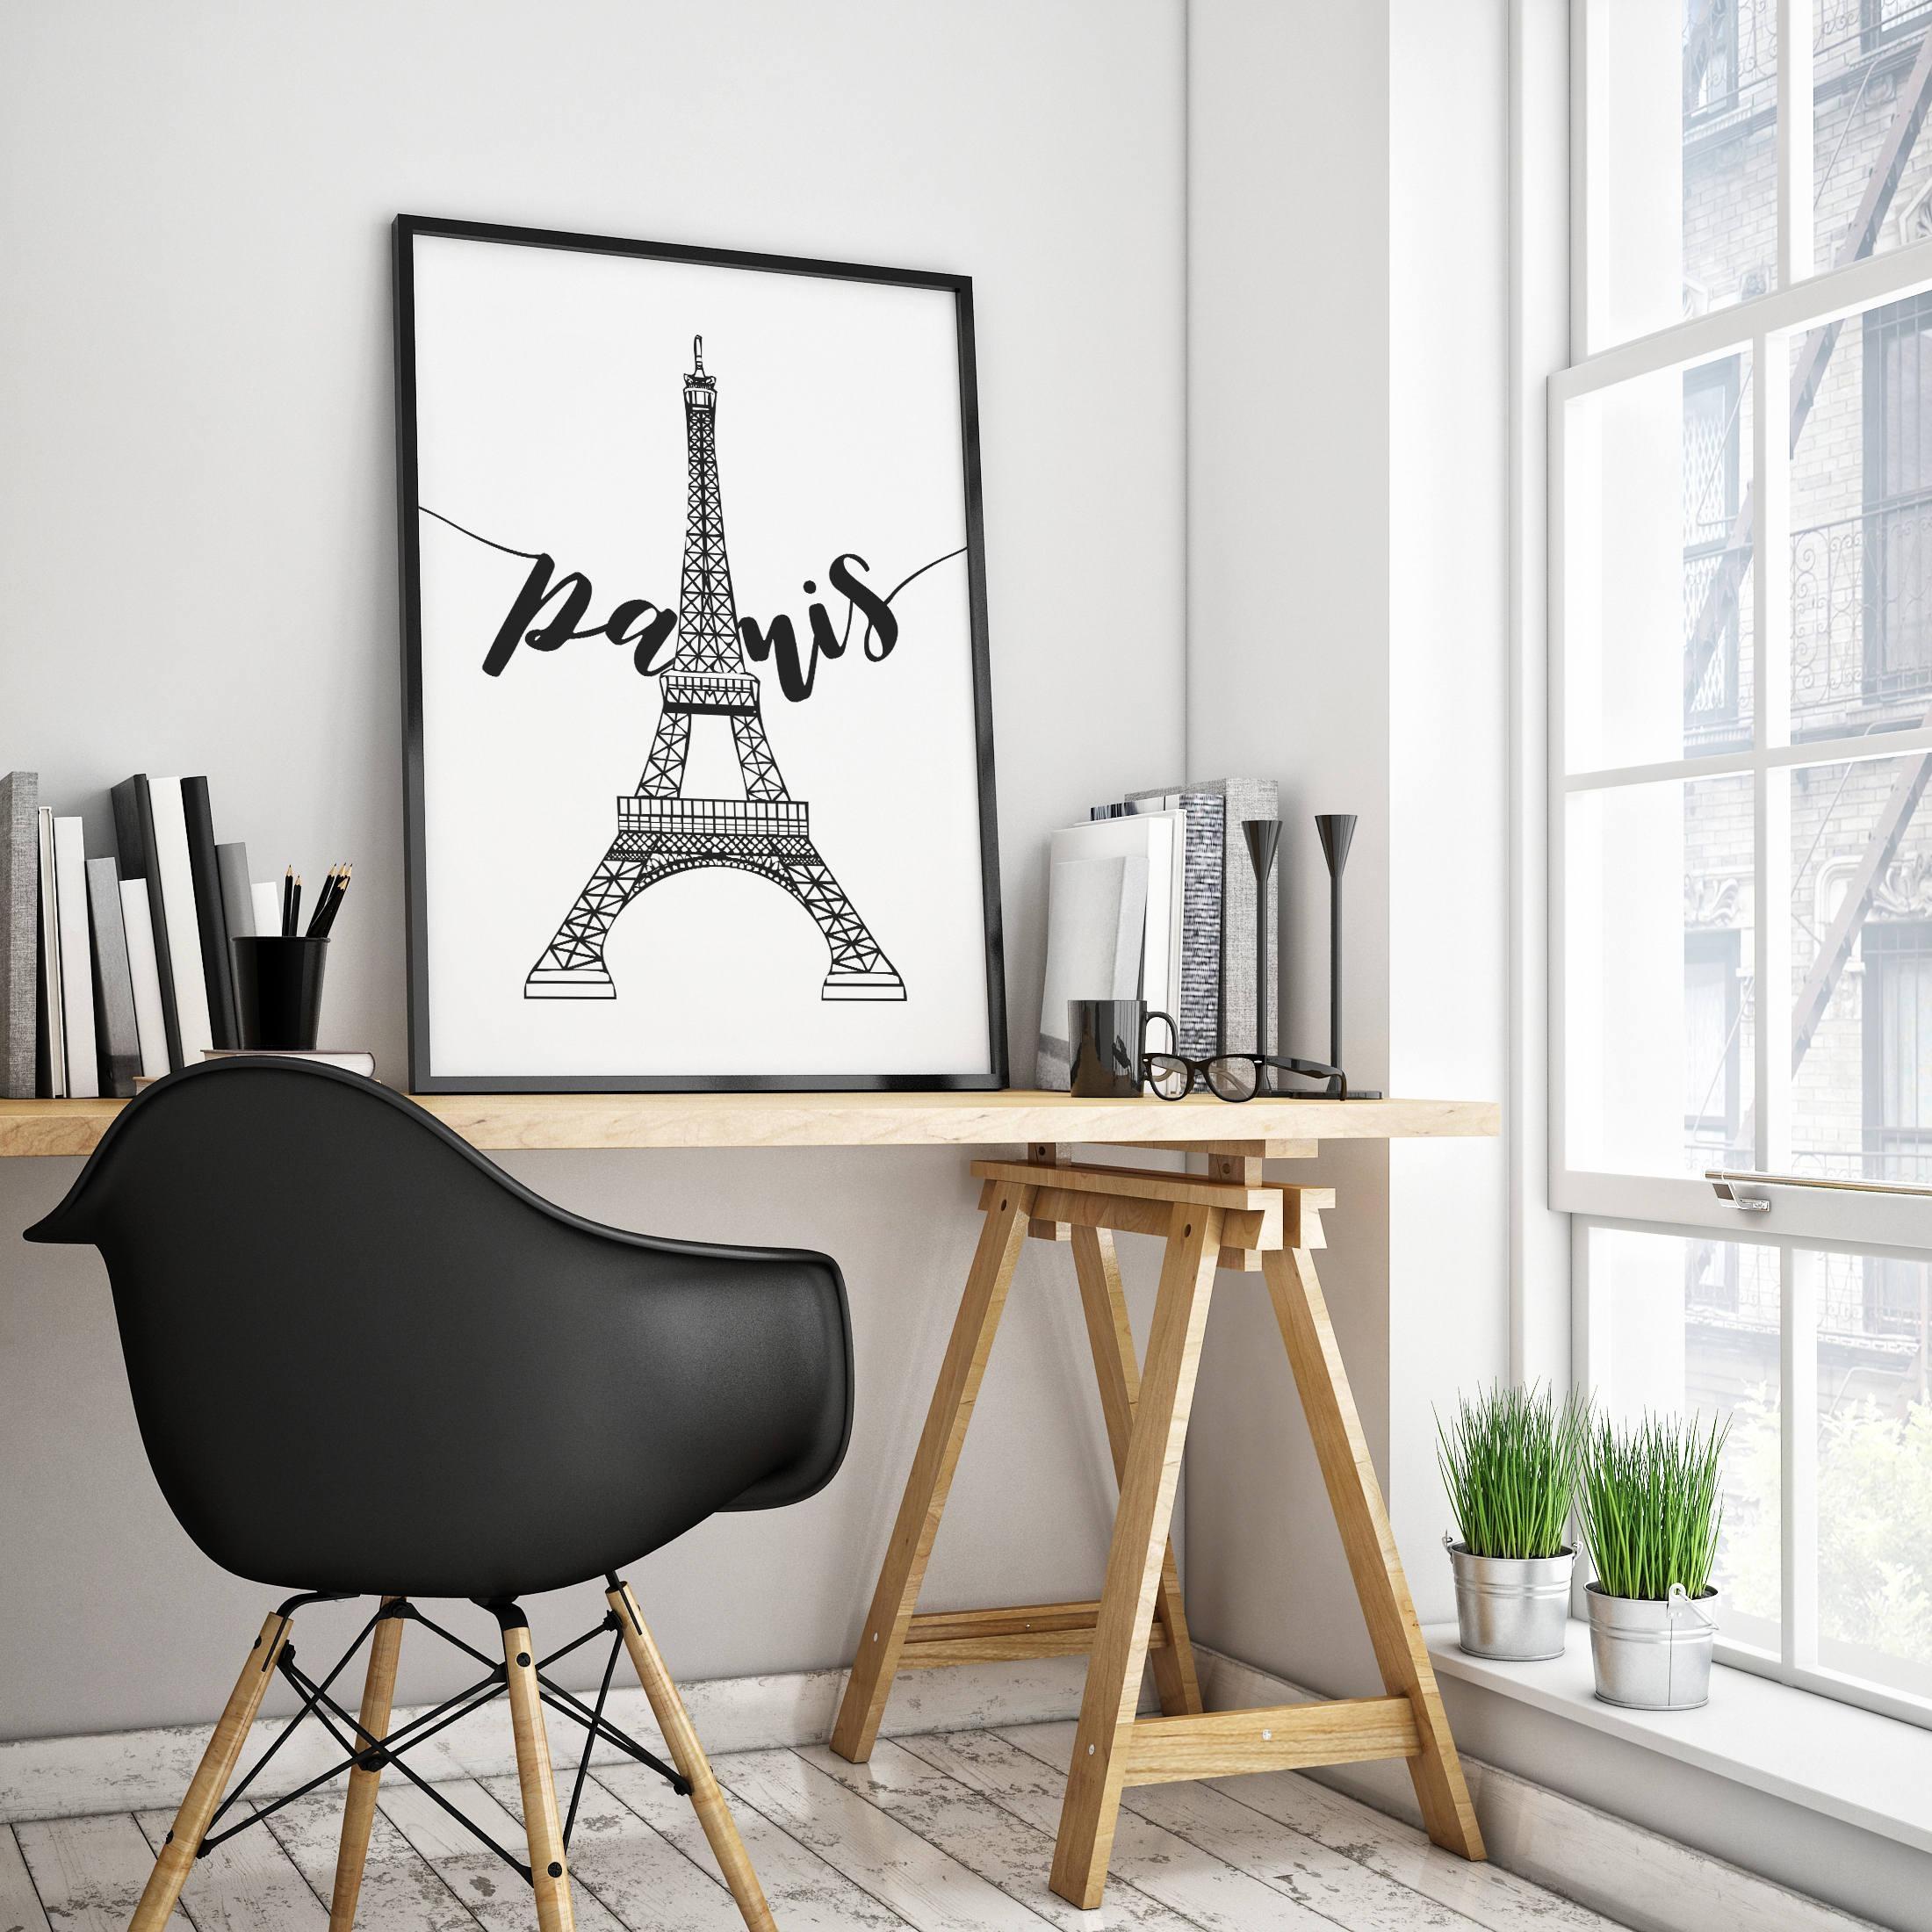 Printable Paris Wall Art Paris Artwork Paris Eiffel Tower Pertaining To Paris Themed Wall Art (Image 13 of 20)